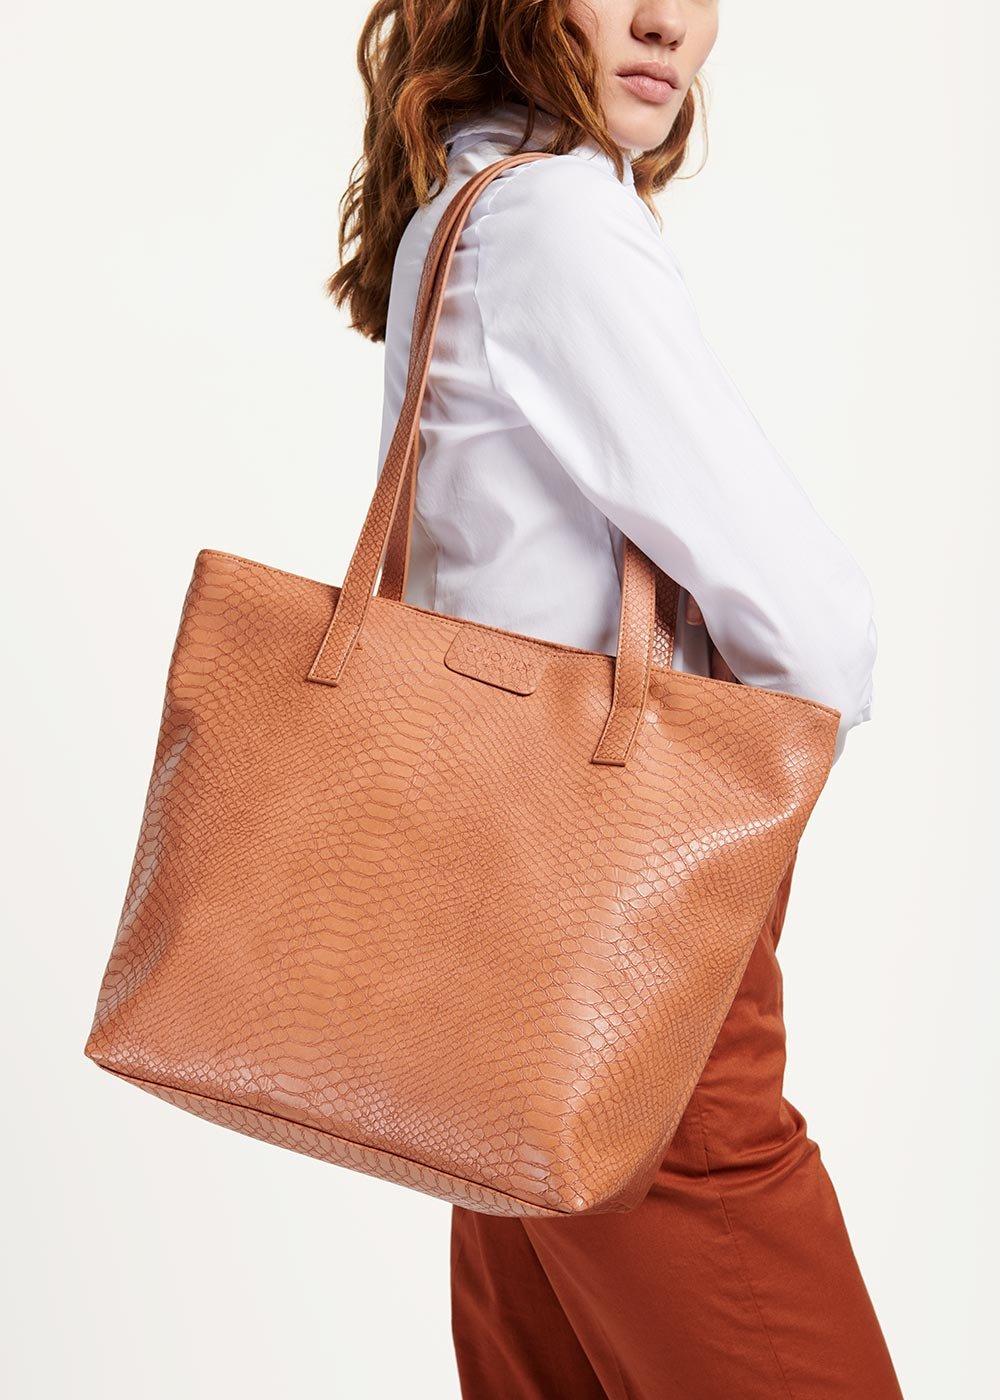 Shopping bag Badias - Sughero - Donna